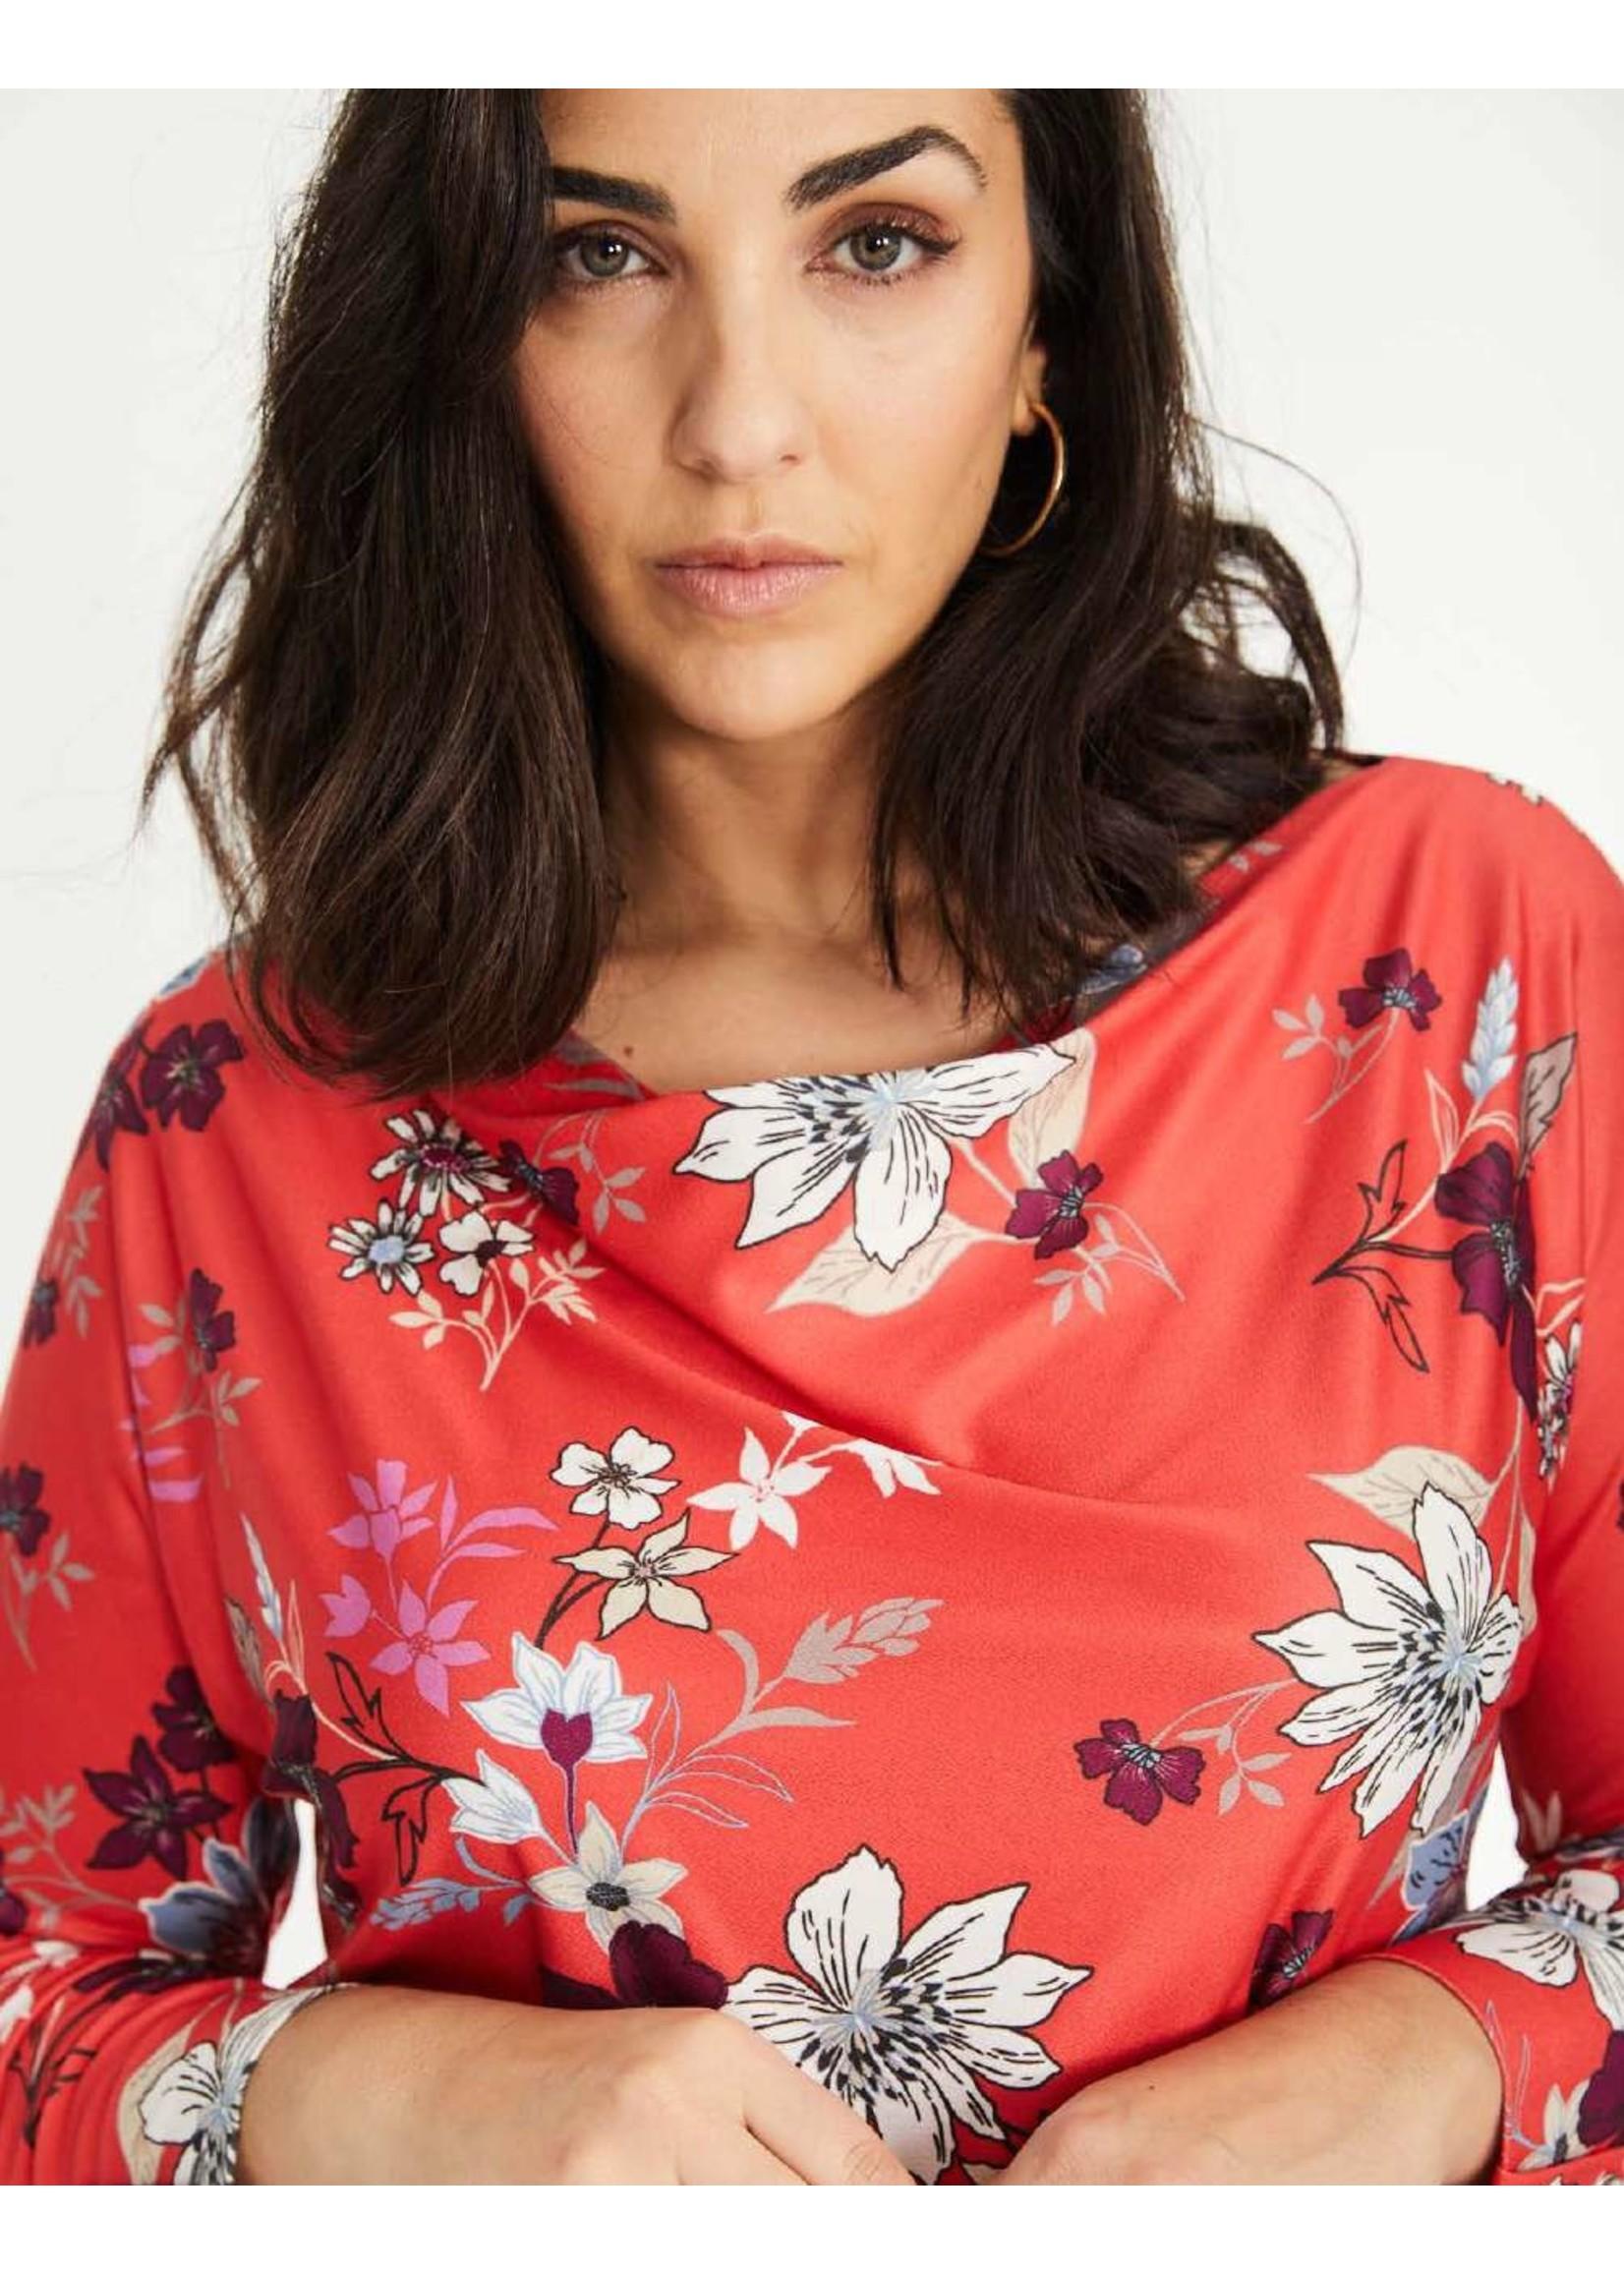 SPG Woman Flowered Drape Neck Top